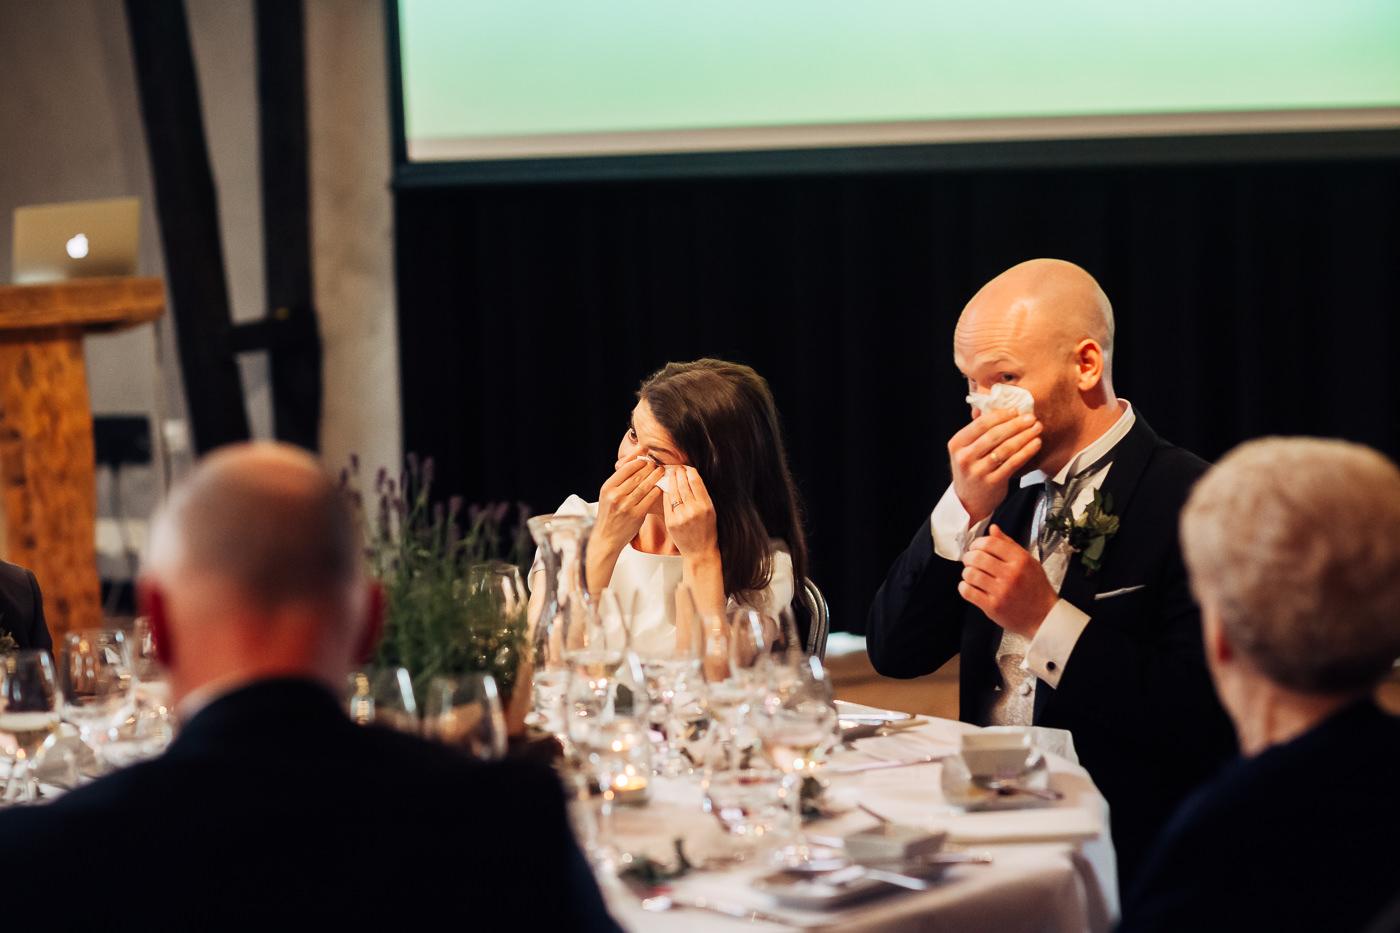 Malene & Ole Martin - elegant dansk- norskt bryllup i Oslo Bryllup Gamle Aker Oslo 18 Akershus